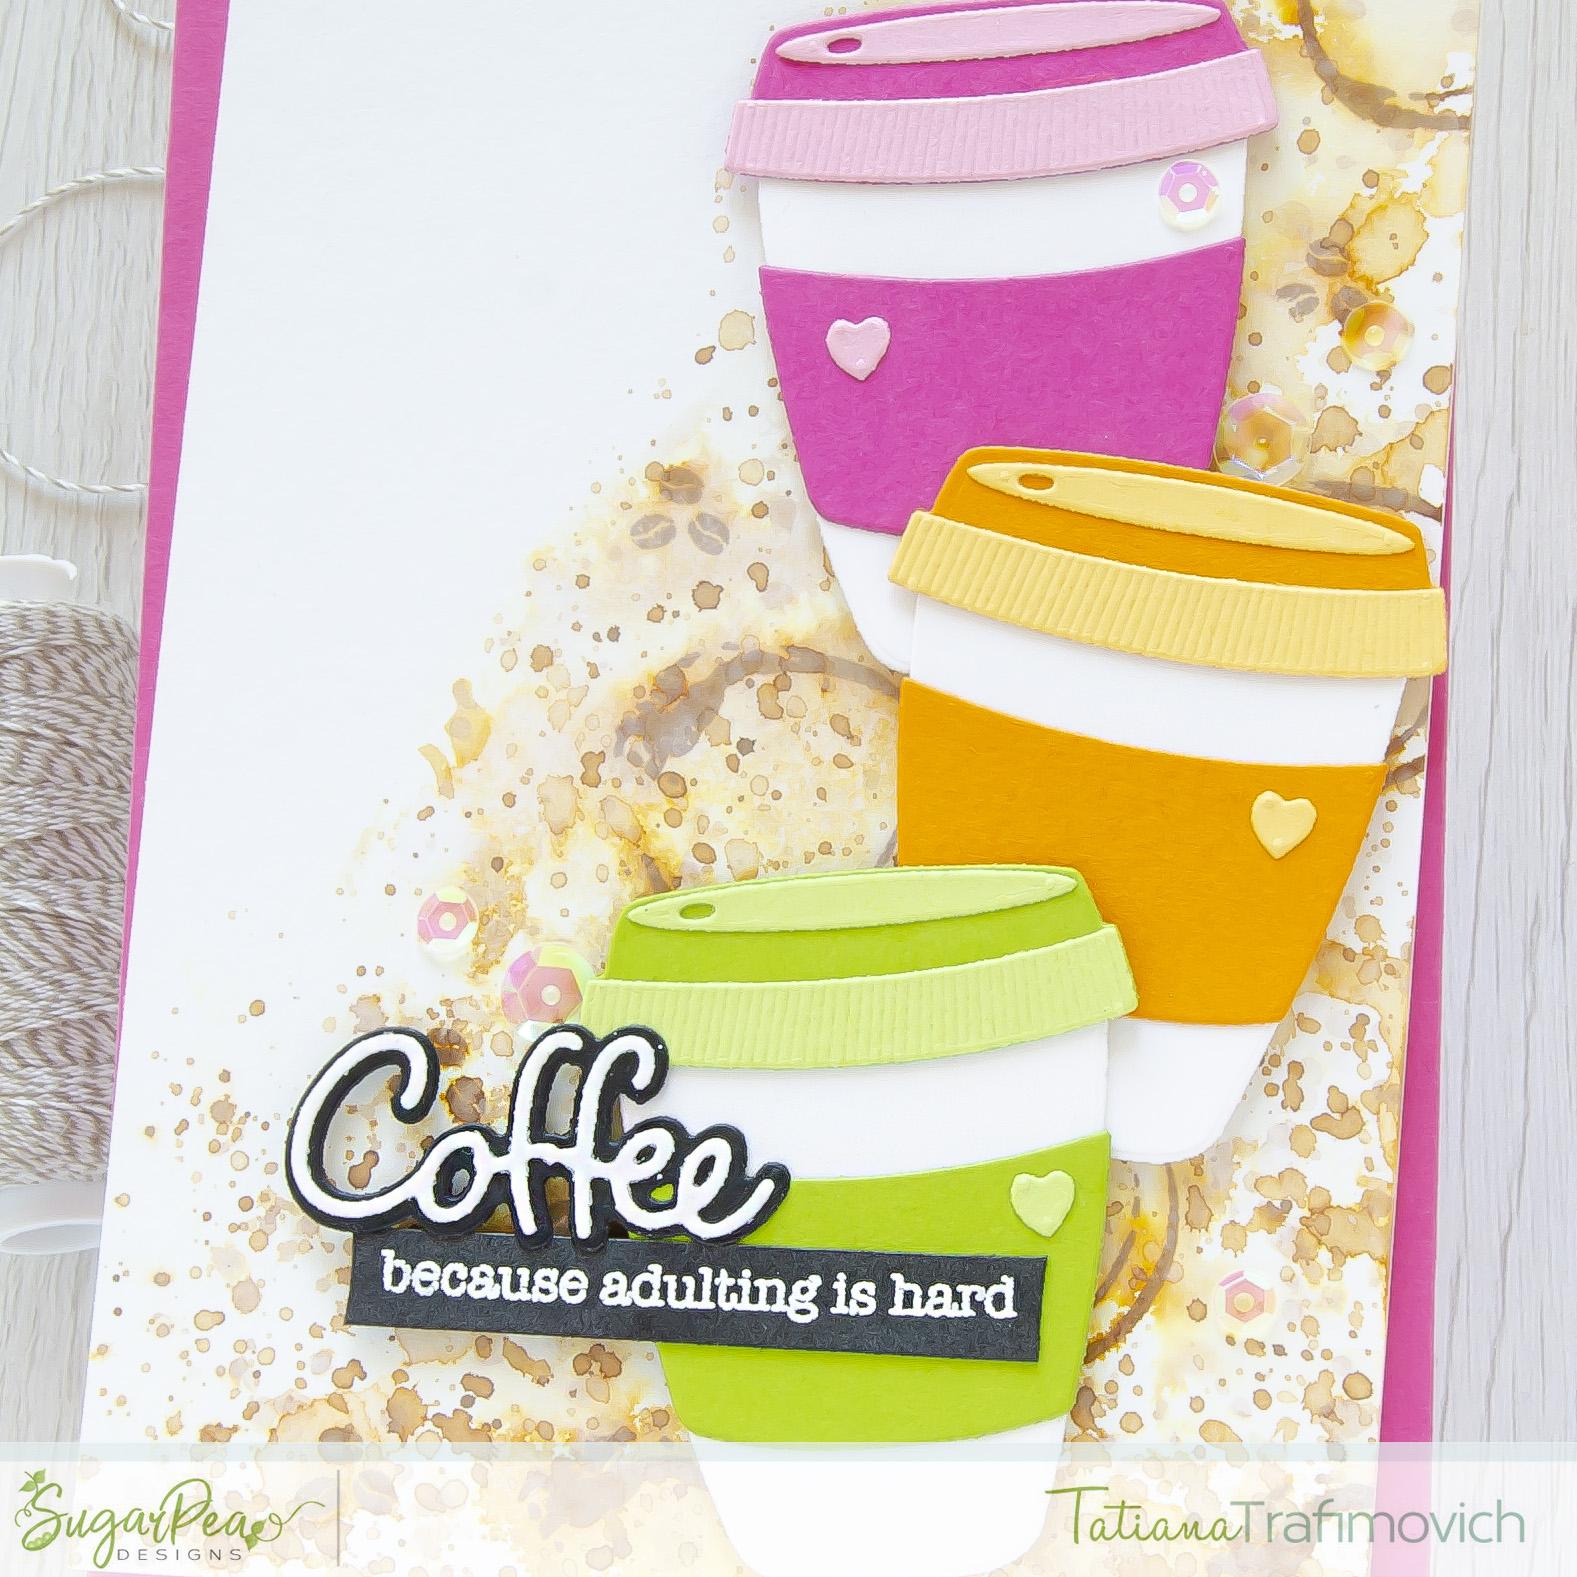 Coffee #handmade card by Tatiana Trafimovich #tatianacraftandart - Coffee Cuties SugarCut by SugarPea Designs #sugarpeadesigns